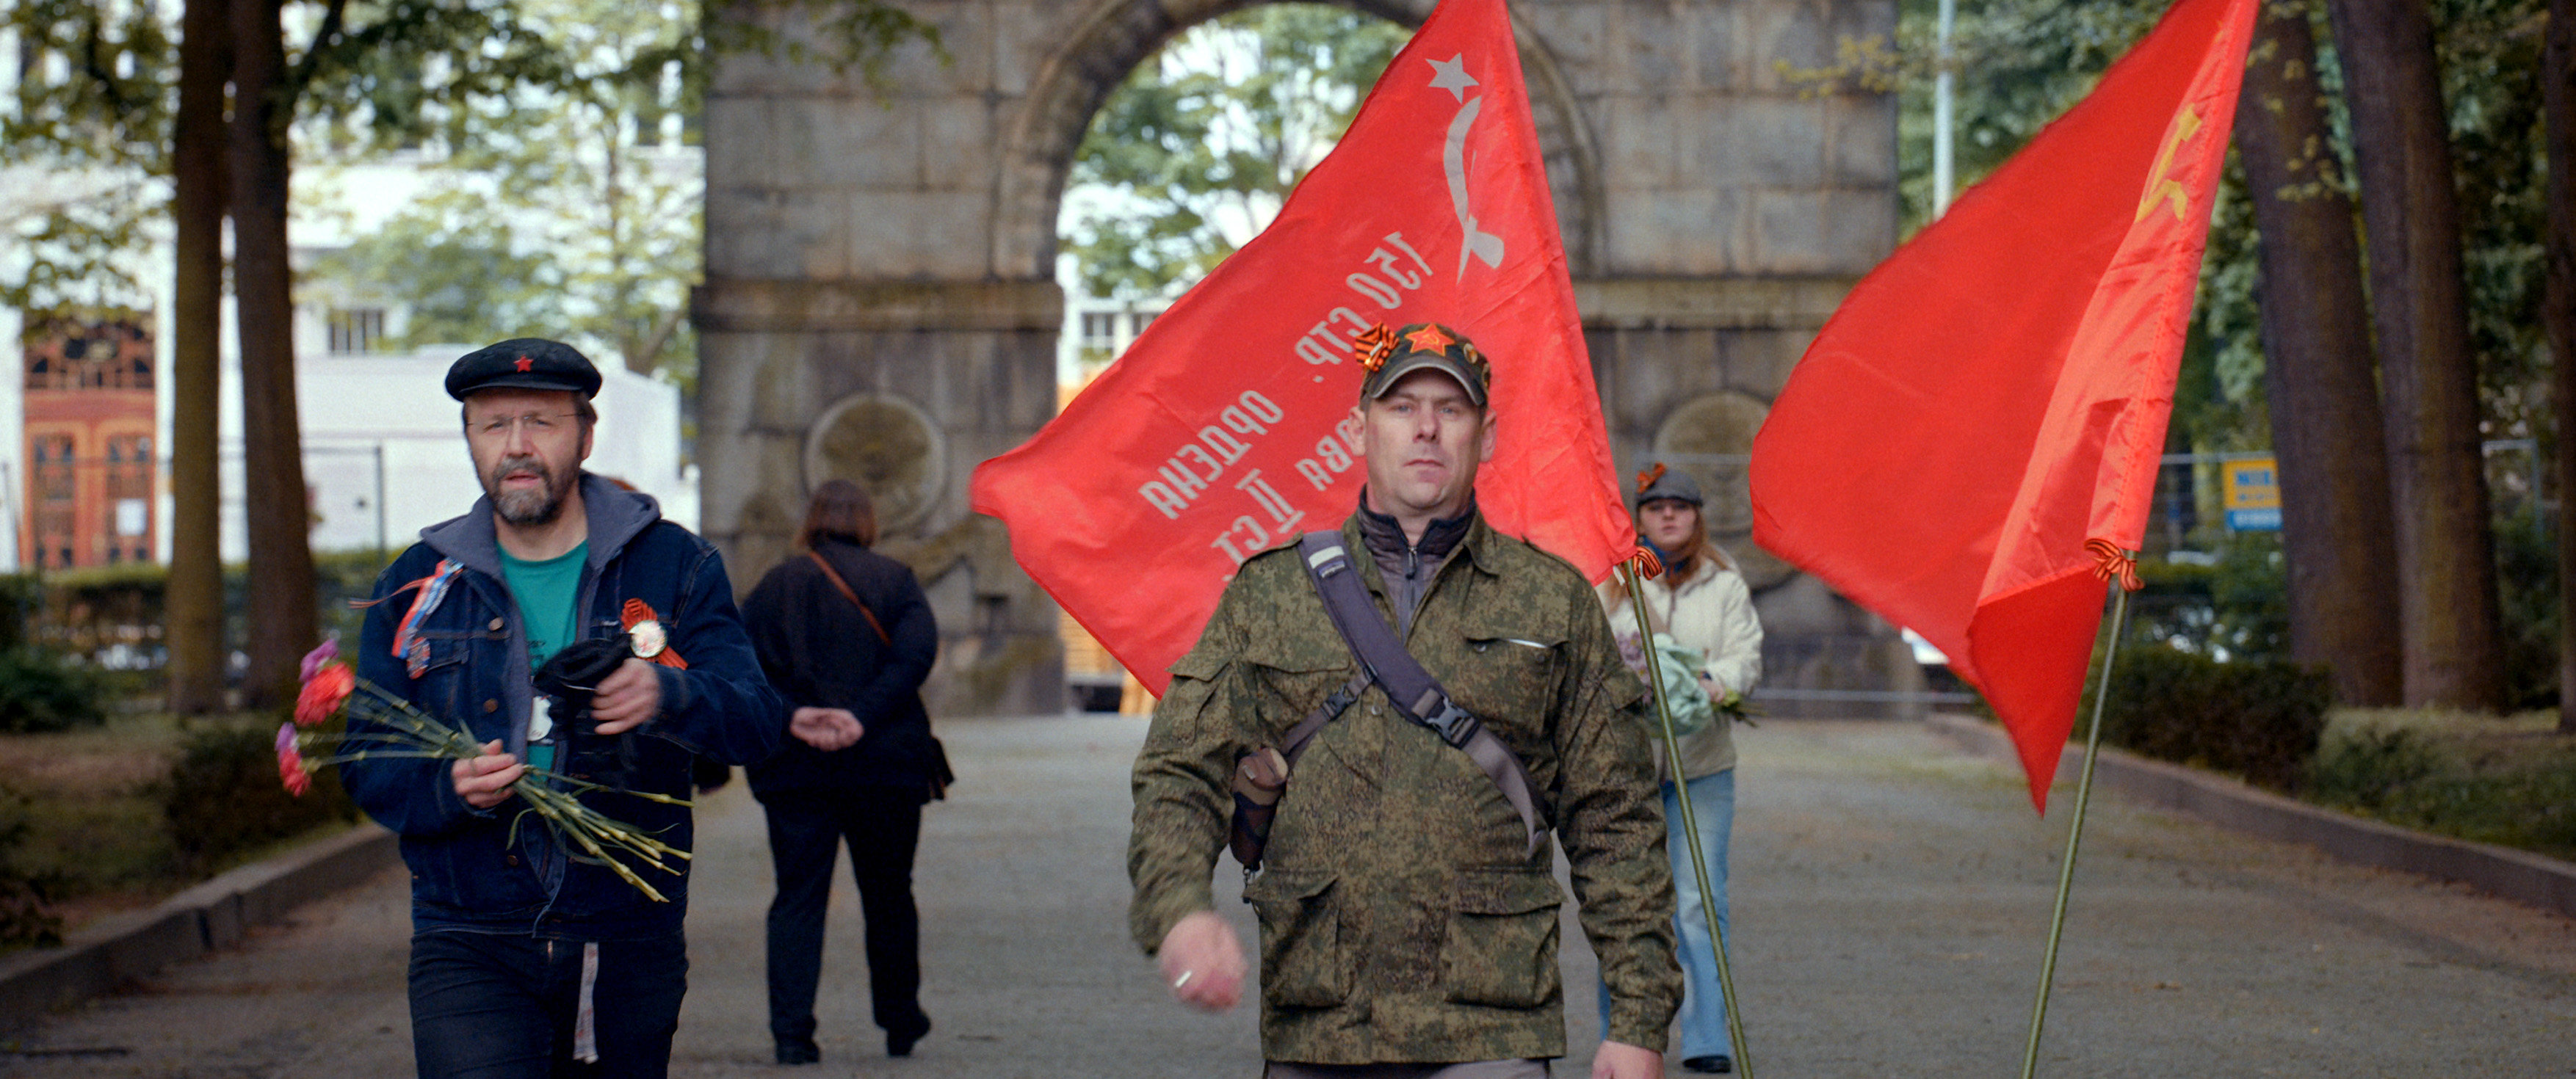 Szene aus dem Berlinale Film Victory Day (Foto: Imperativ Film)